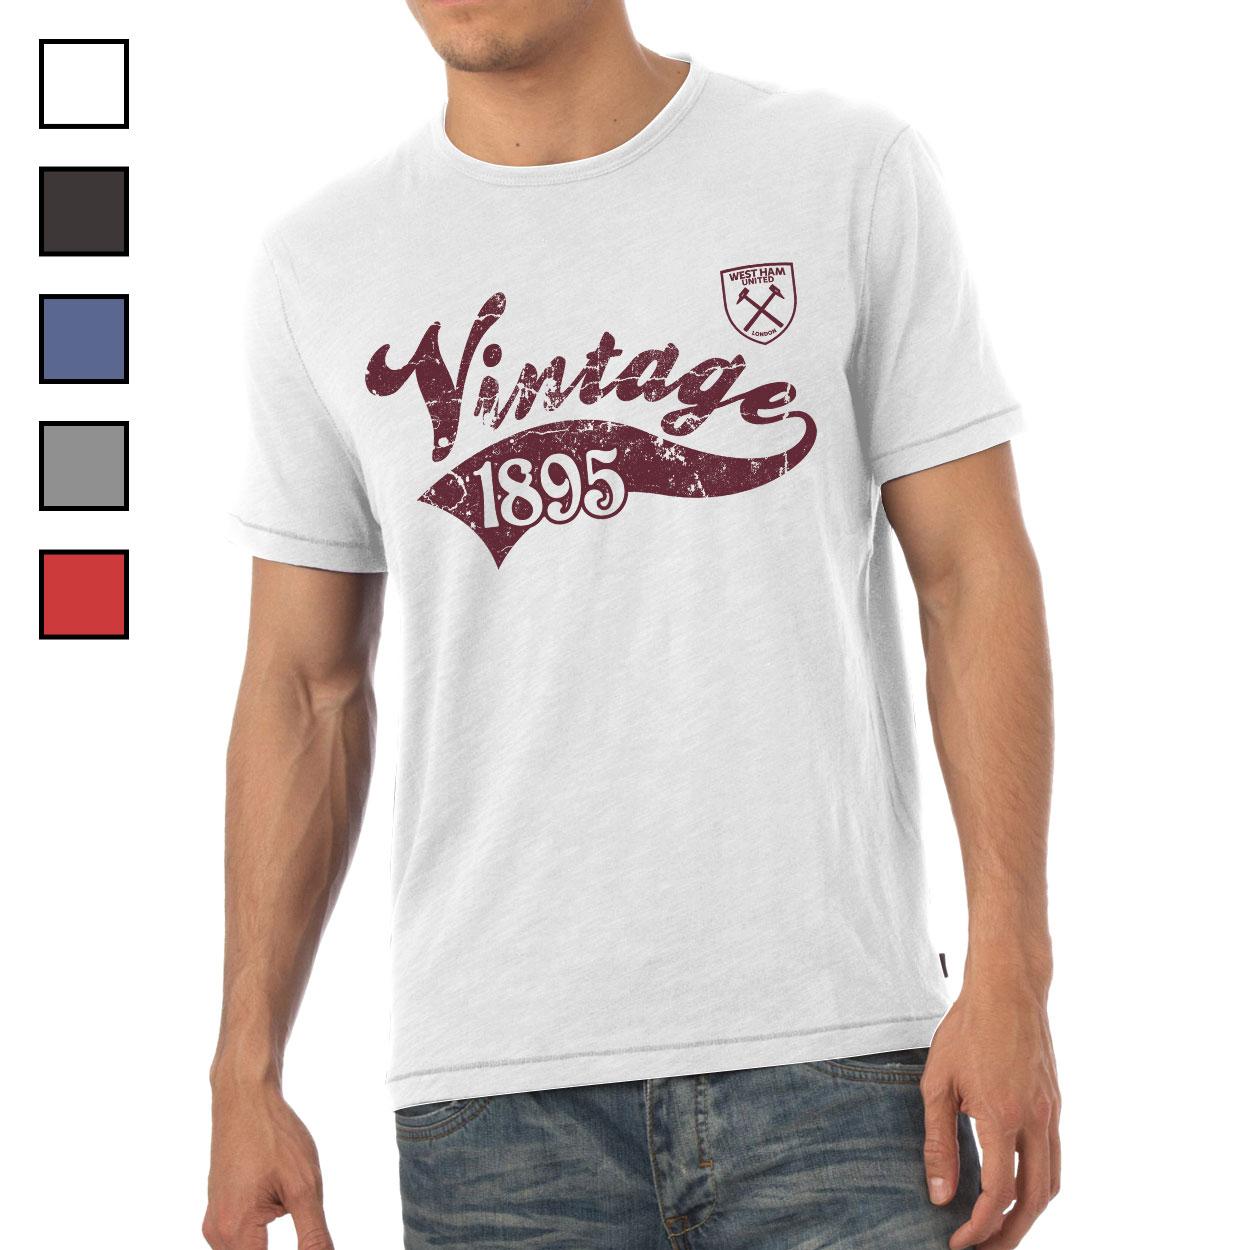 West Ham United FC Mens Vintage T-Shirt